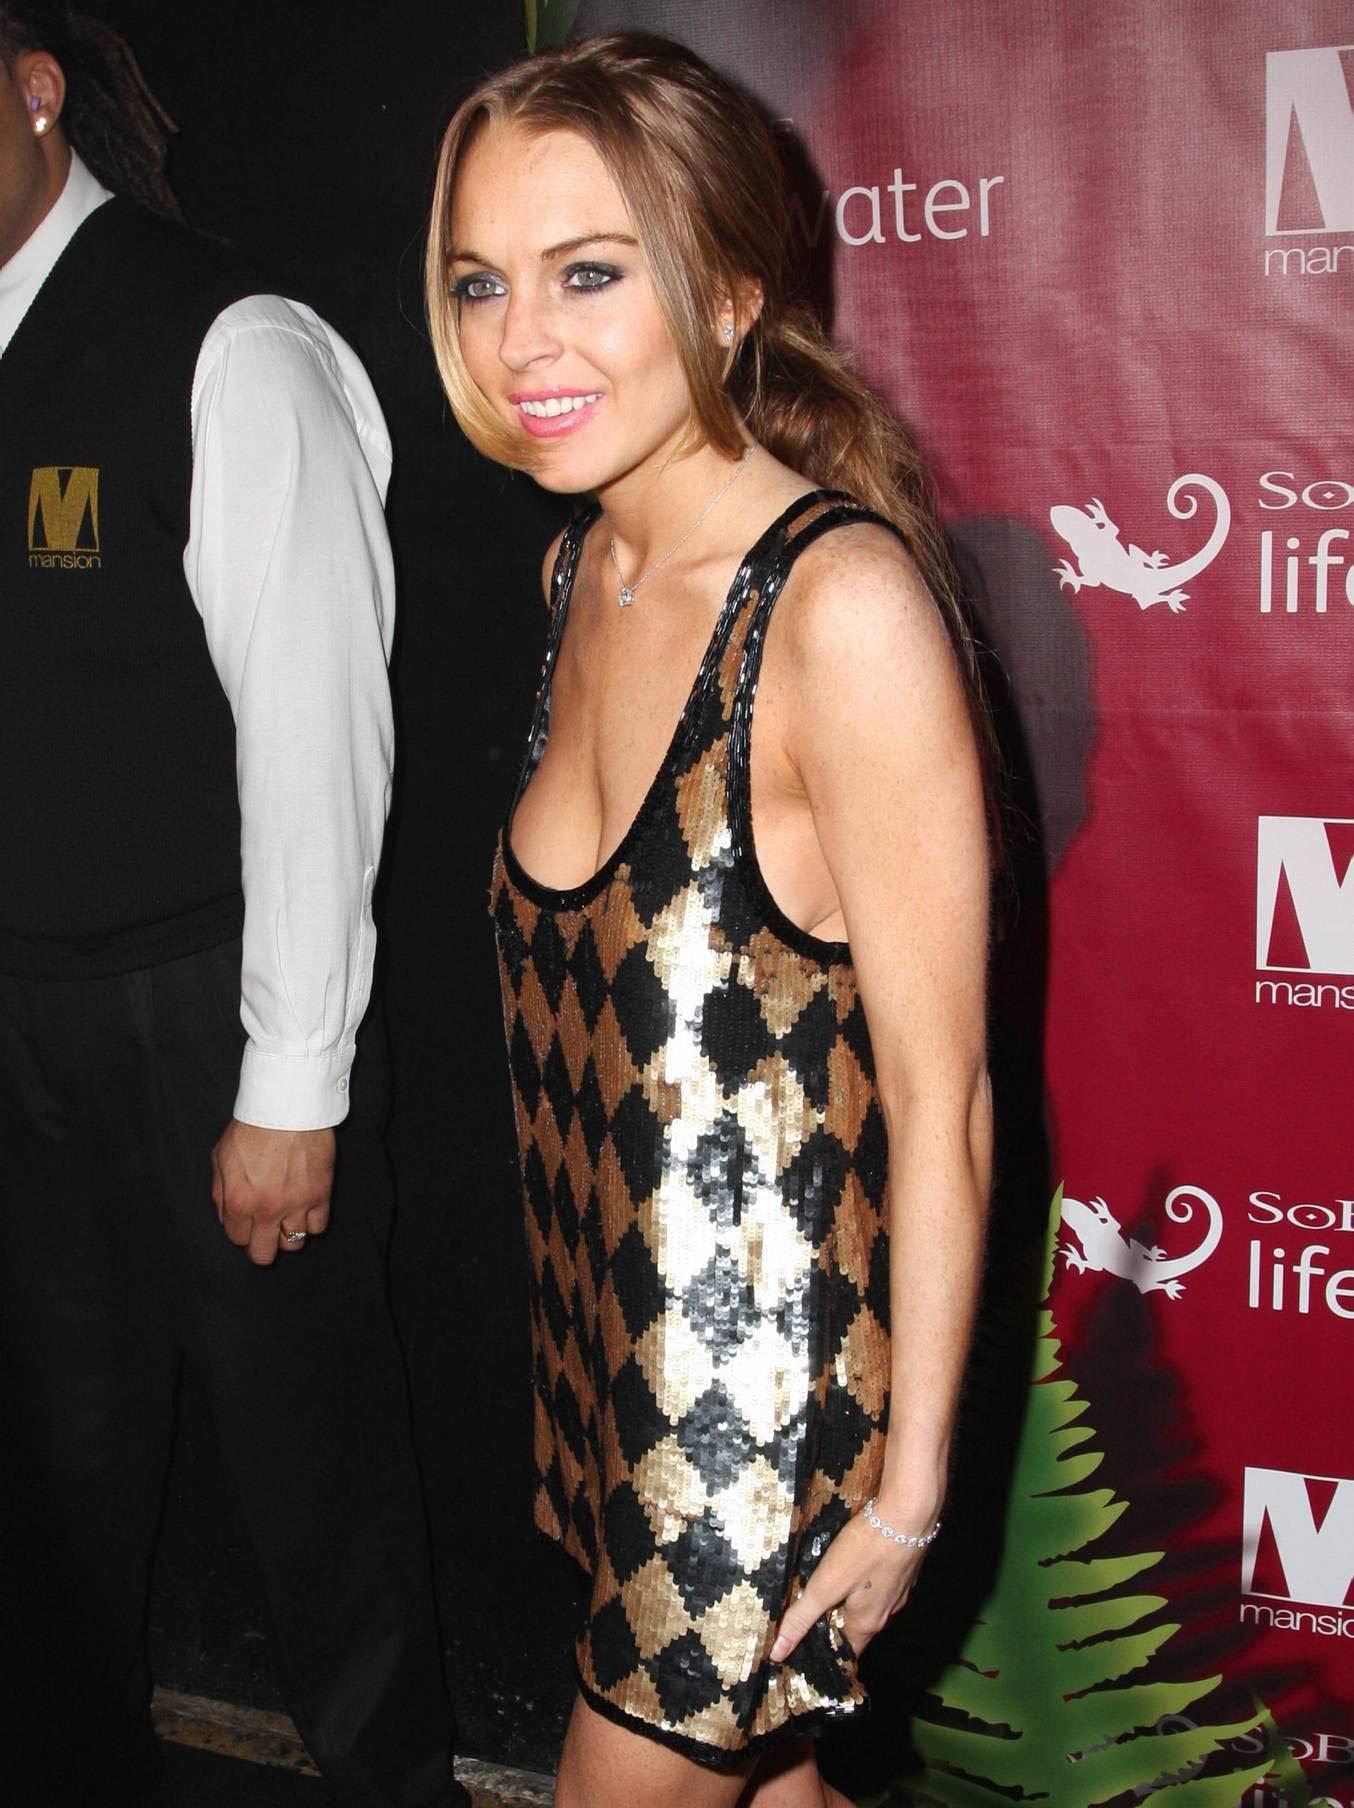 37993_Lindsay_Lohan_at_Mansion_Nightclub_in_Miami_1-1-2009_003_122_387lo.jpg